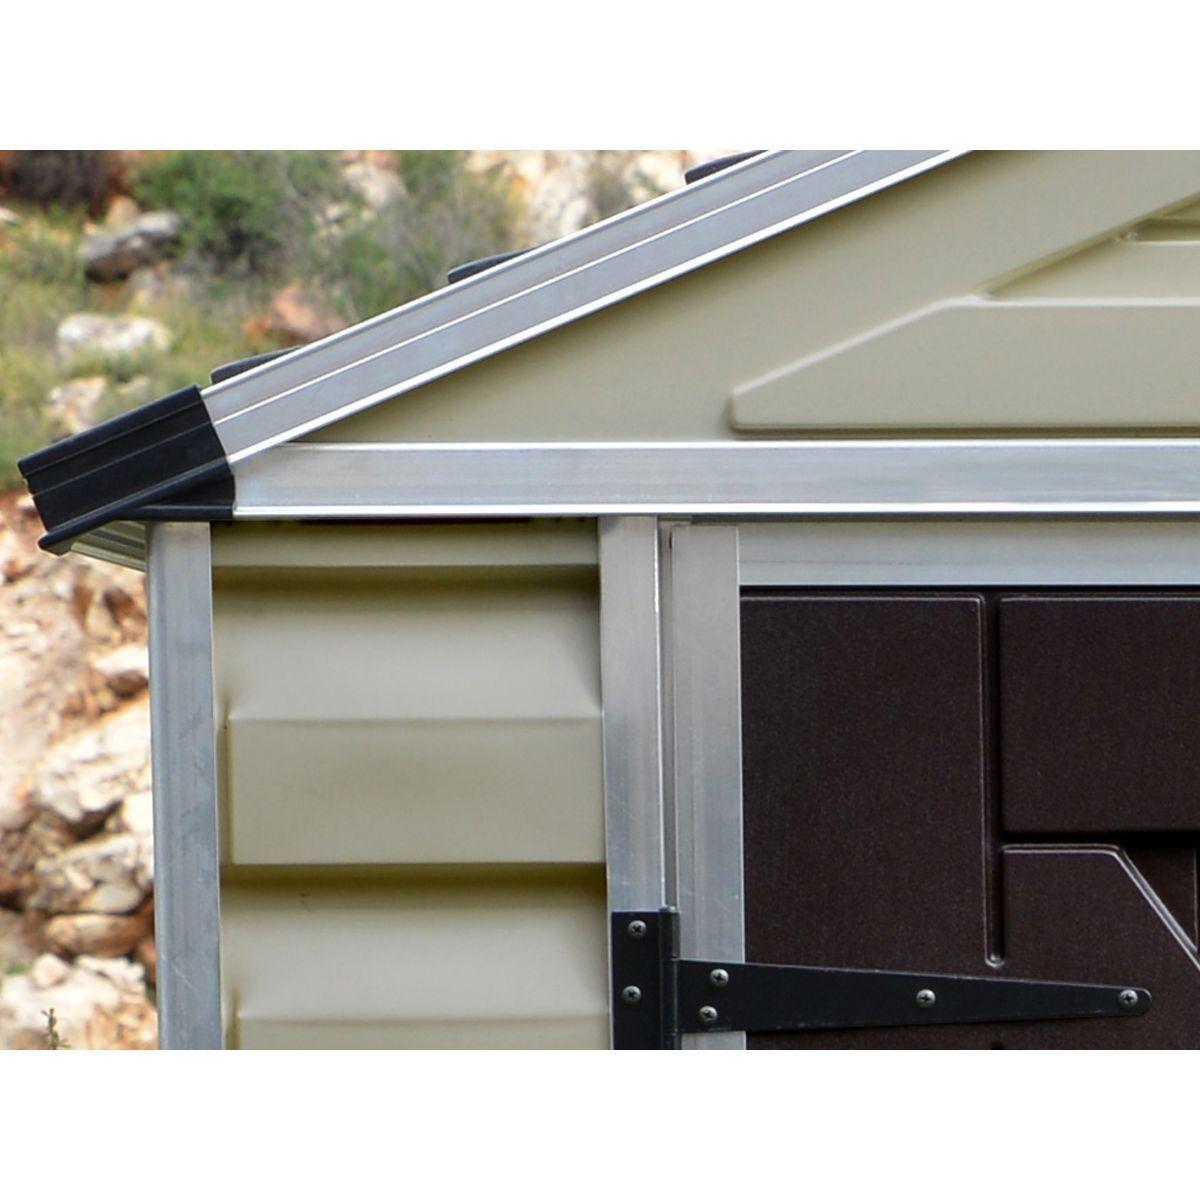 Abri De Jardin Polycarbonate Skylight 4 25 M2 Marron Taille Taille Unique Abri De Jardin Jardins En Bois Et Porte Battante